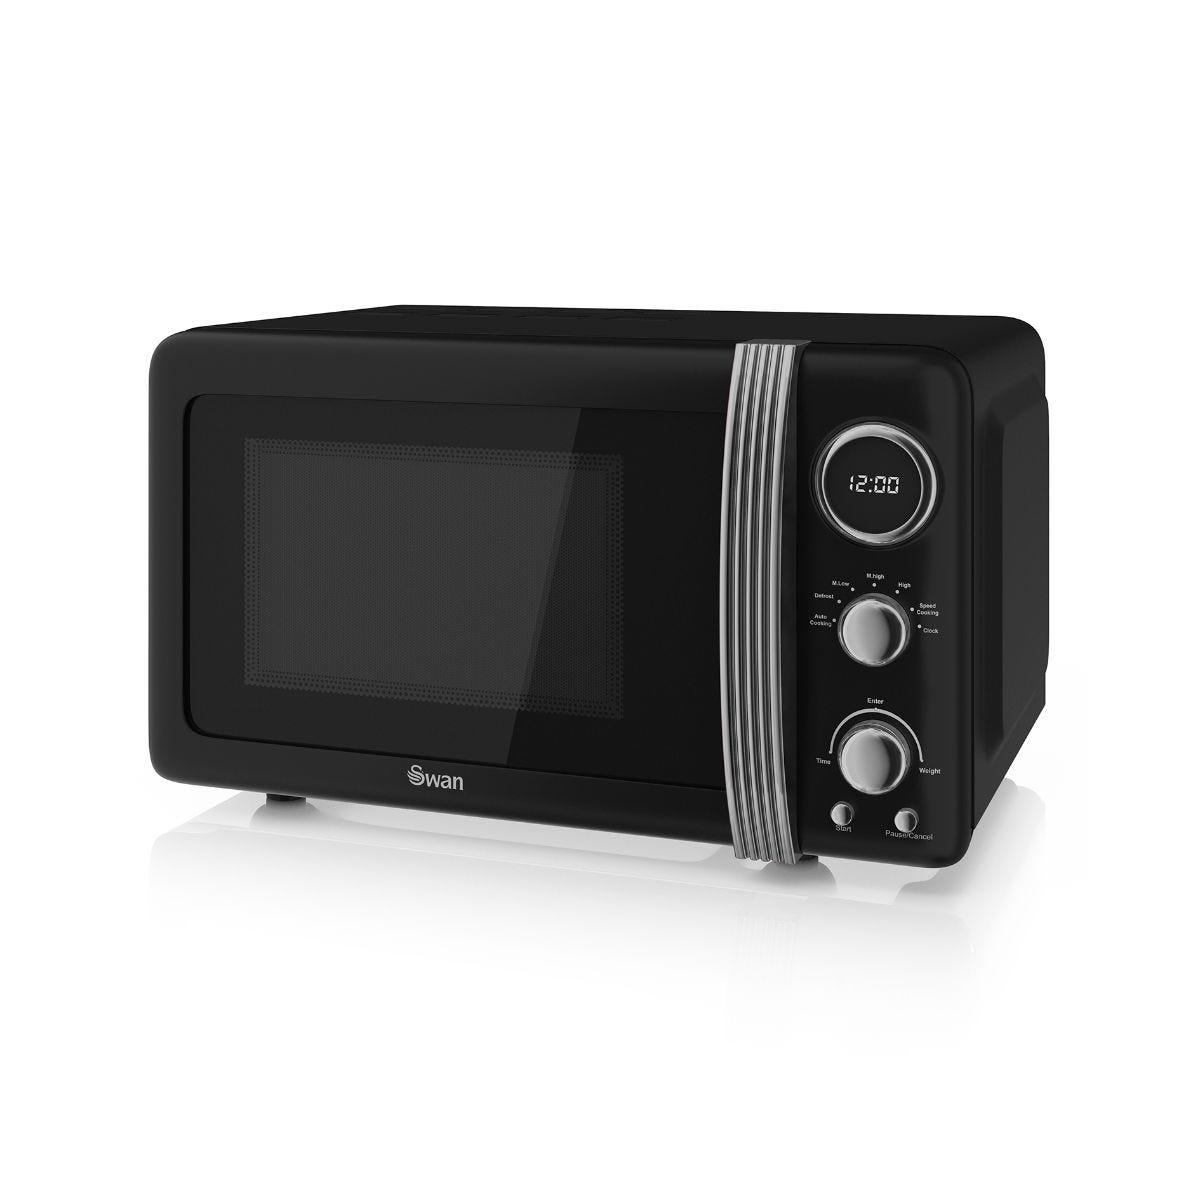 800W Retro Digital Microwave, Black